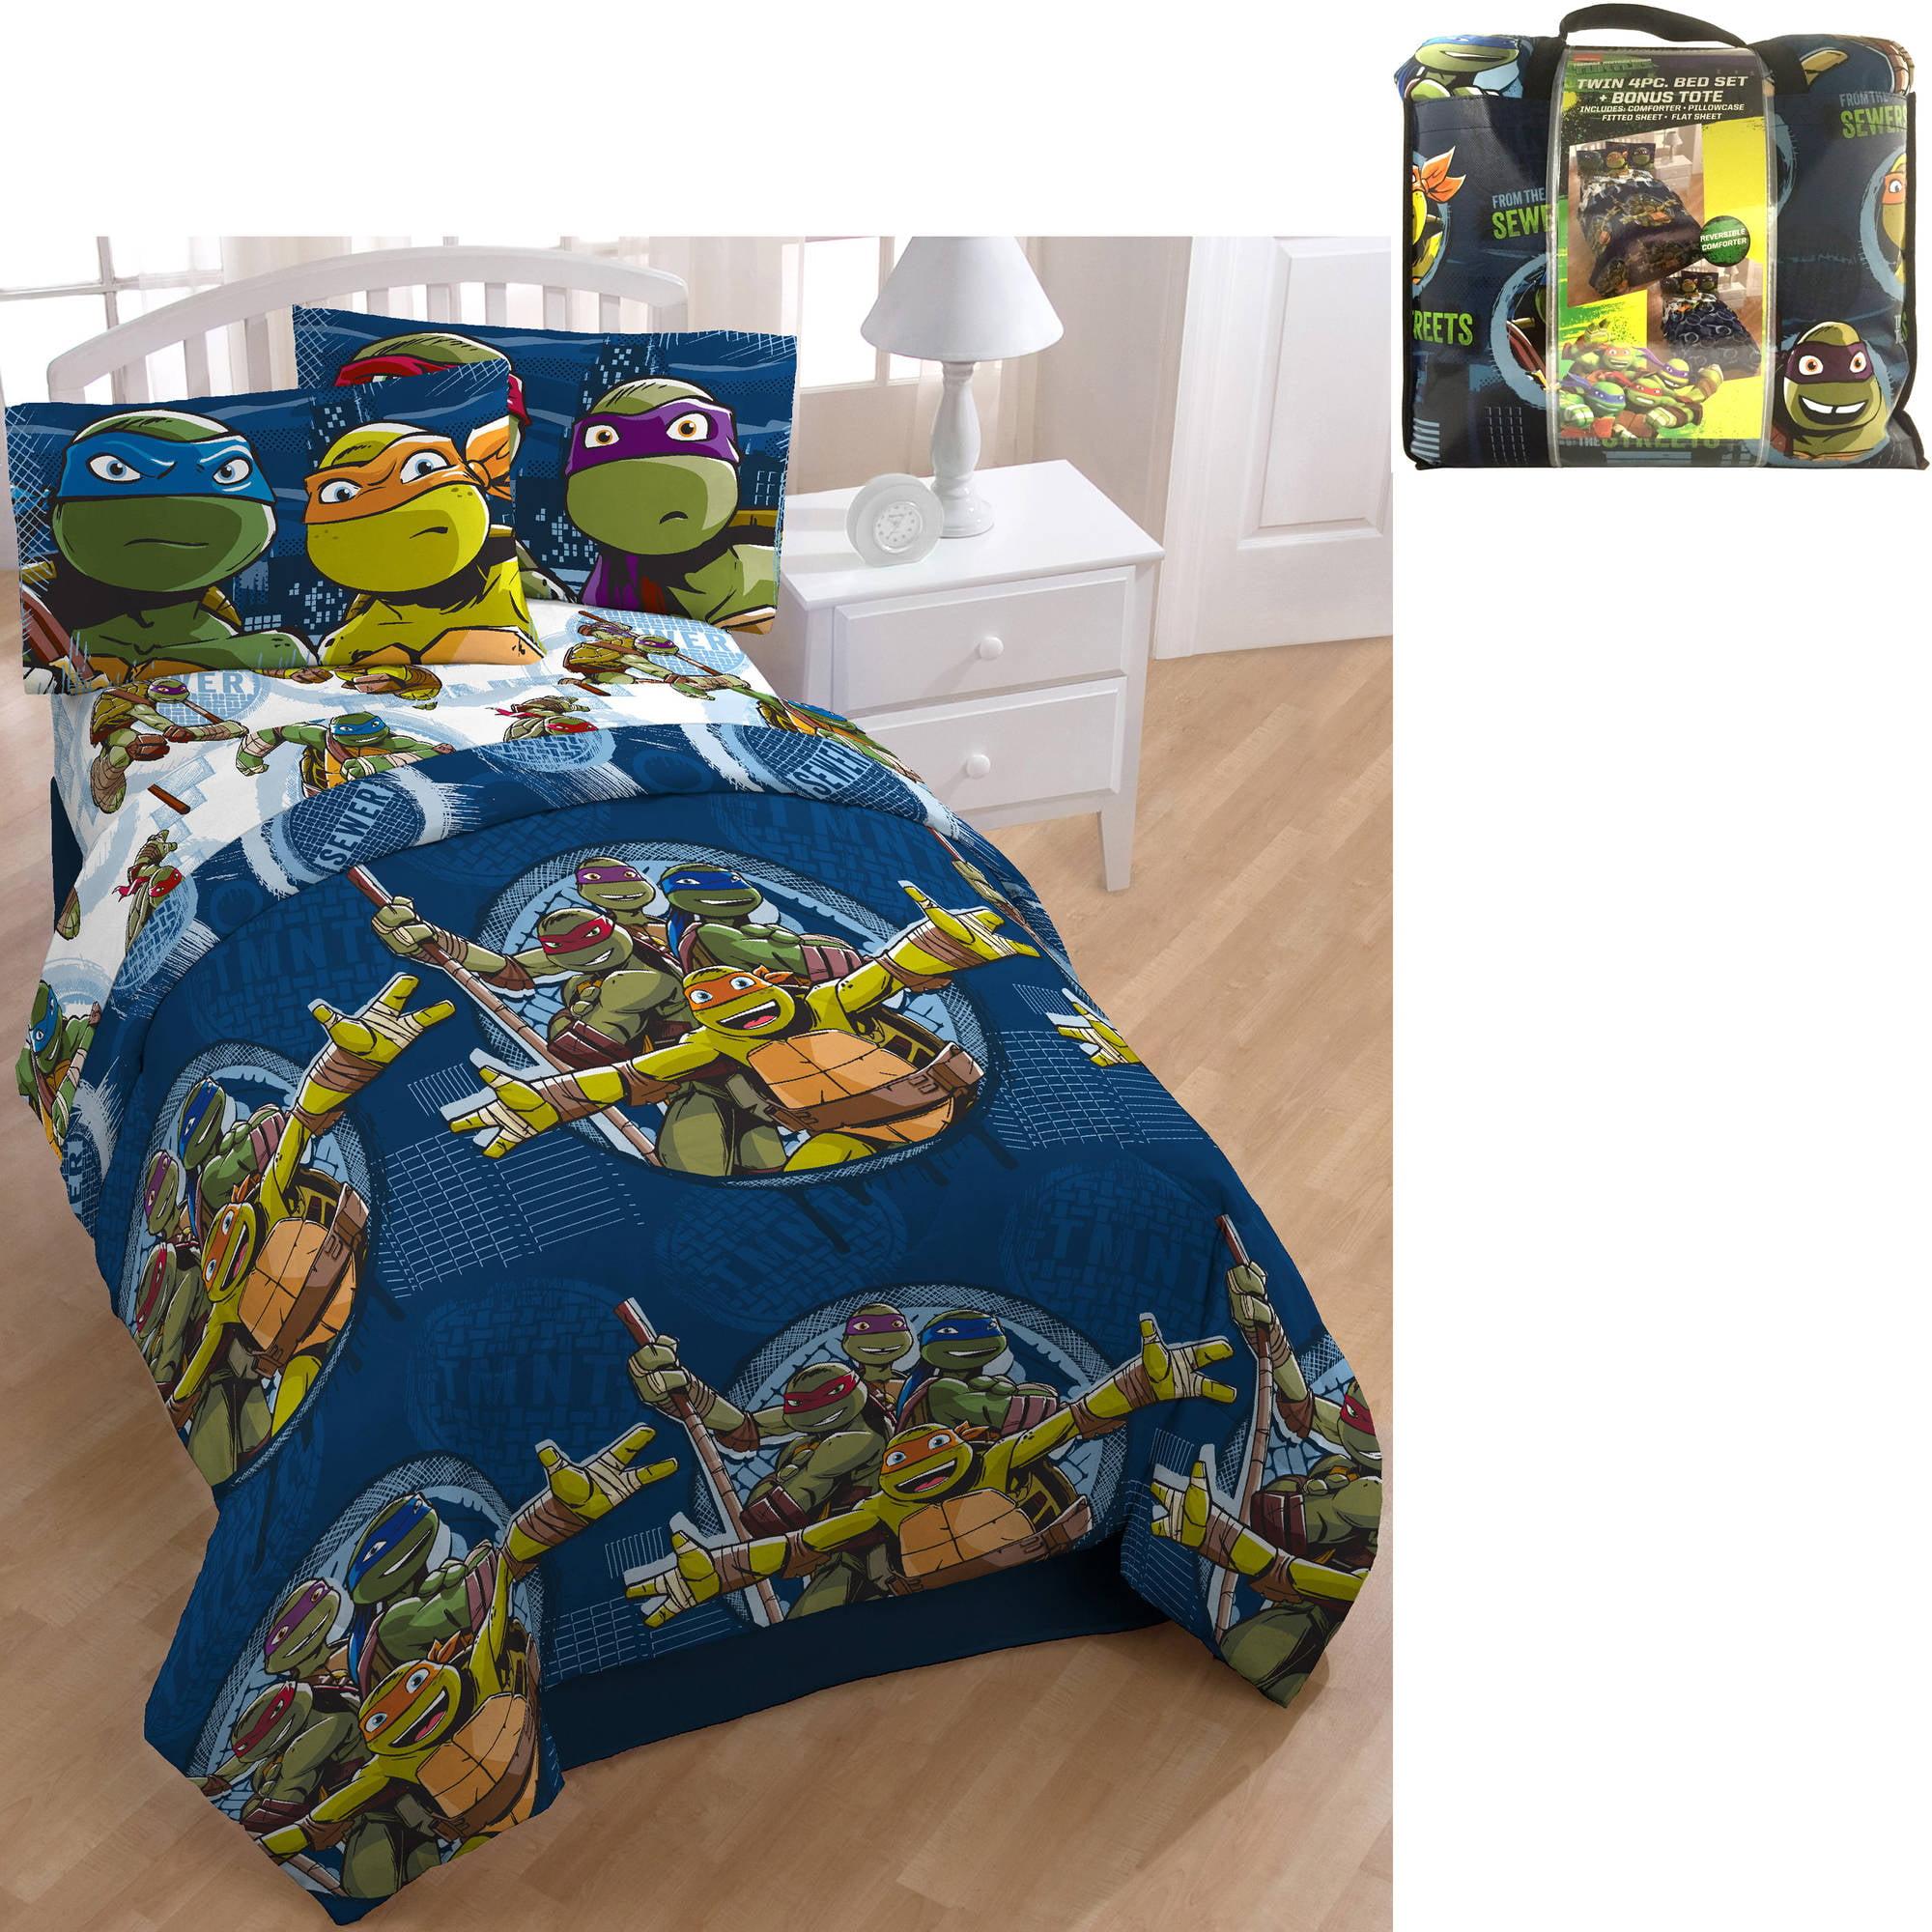 Teenage Mutant Ninja Turtles Plastic 3d Toddler Bed 6